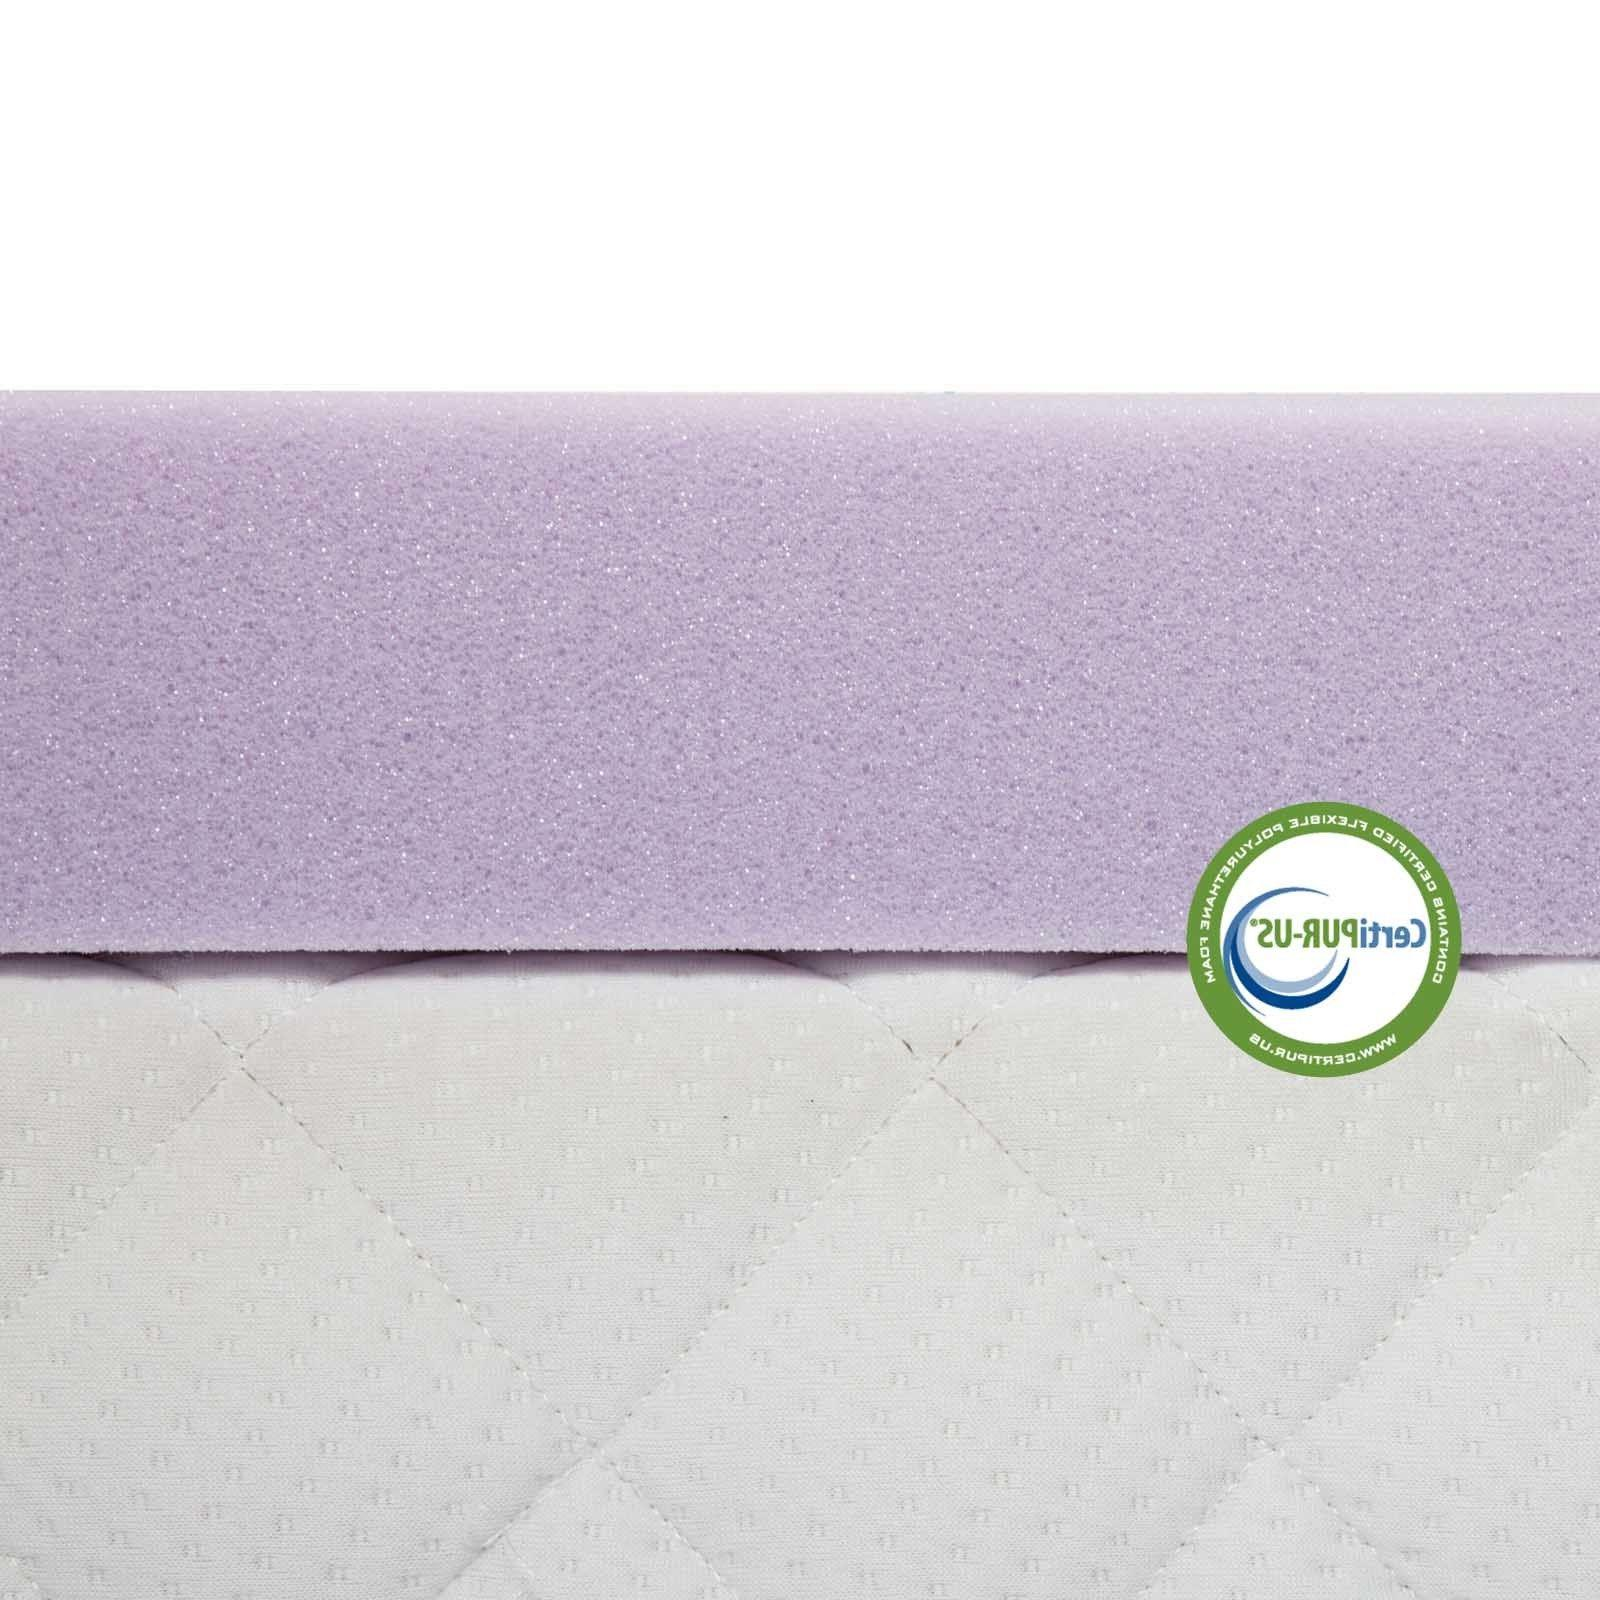 Lavender 3 Foam Mattress Full Queen Twin